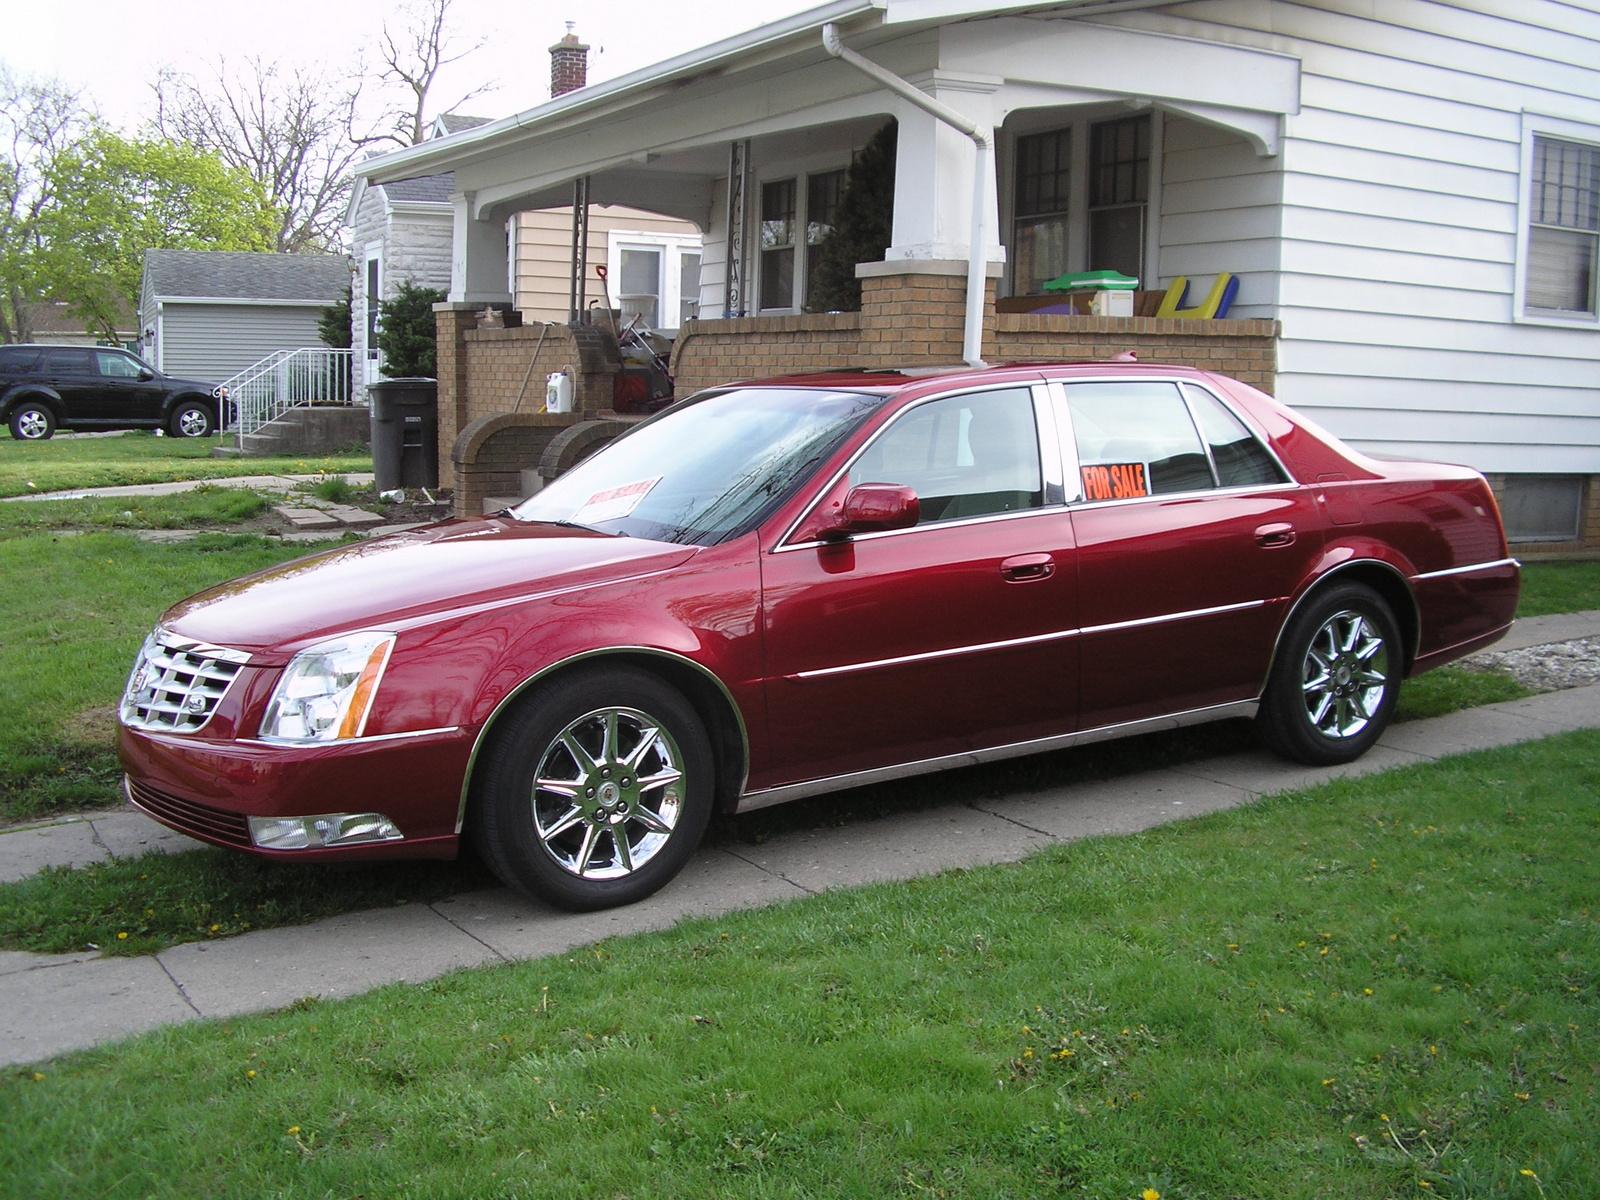 2010 Cadillac Dts Pictures Cargurus